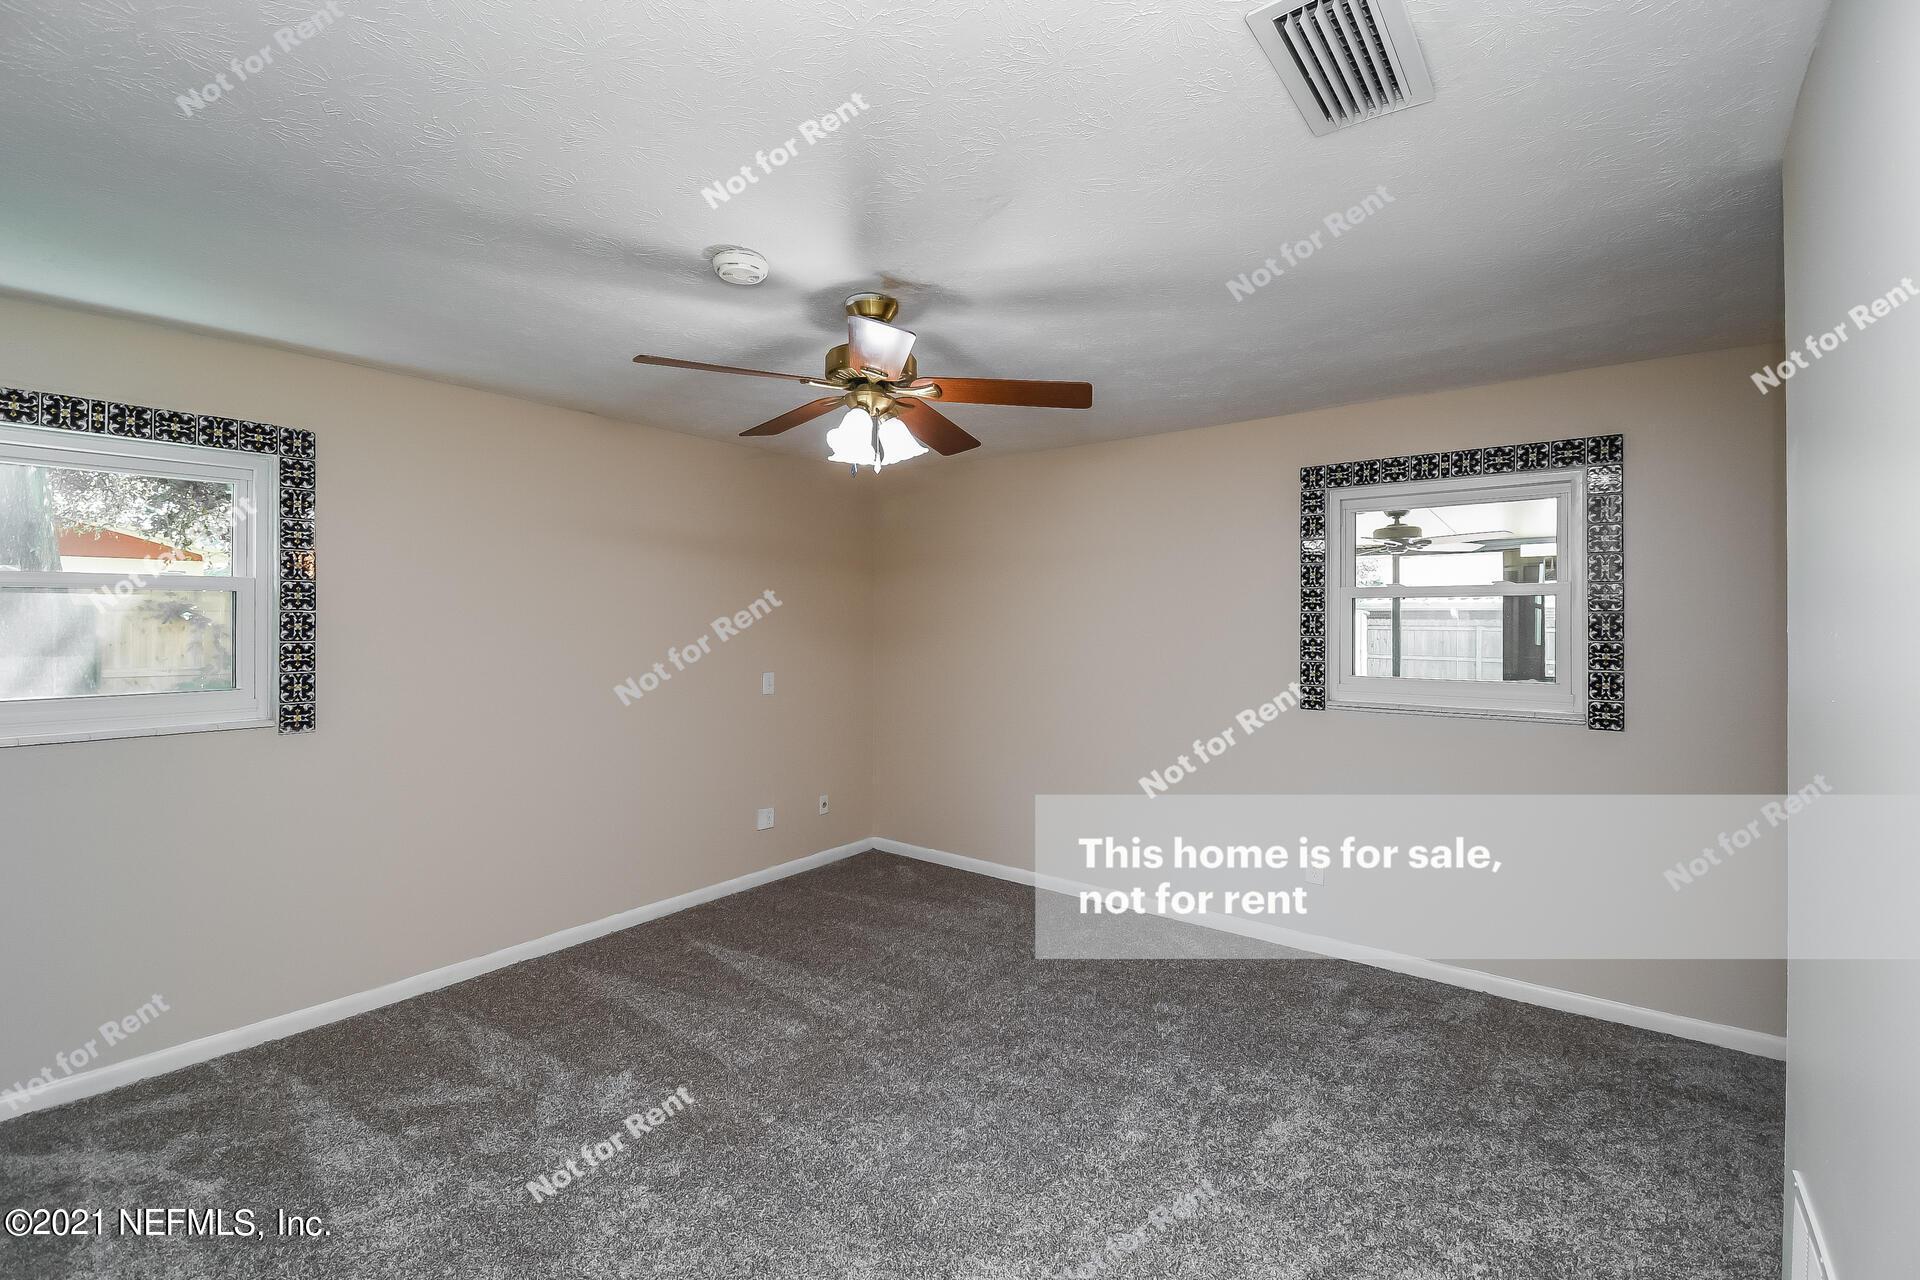 3683 RED OAK, ORANGE PARK, FLORIDA 32073, 3 Bedrooms Bedrooms, ,2 BathroomsBathrooms,Residential,For sale,RED OAK,1134518